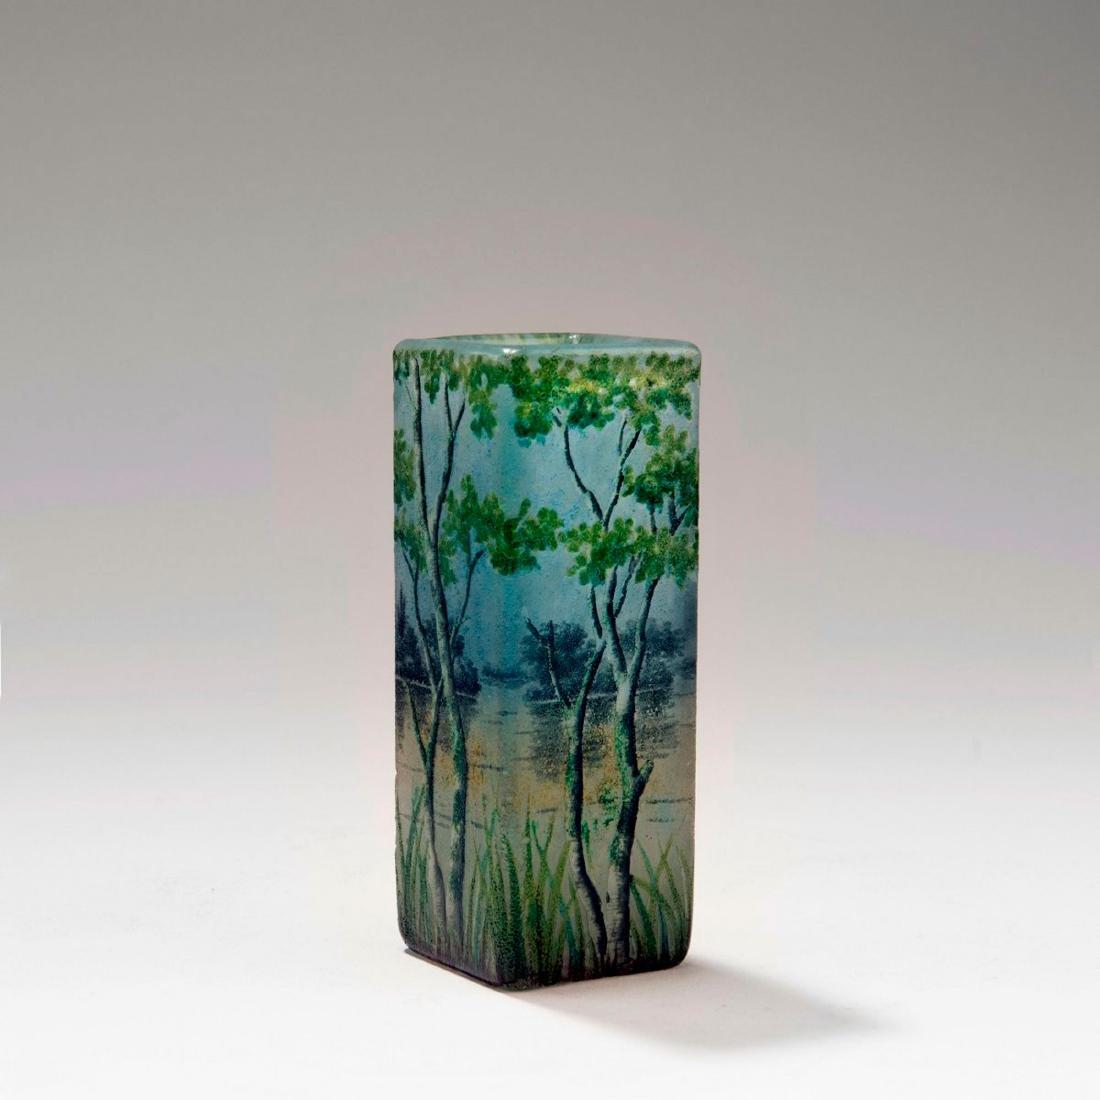 Small 'Paysage lacustre' vase, 1905-10